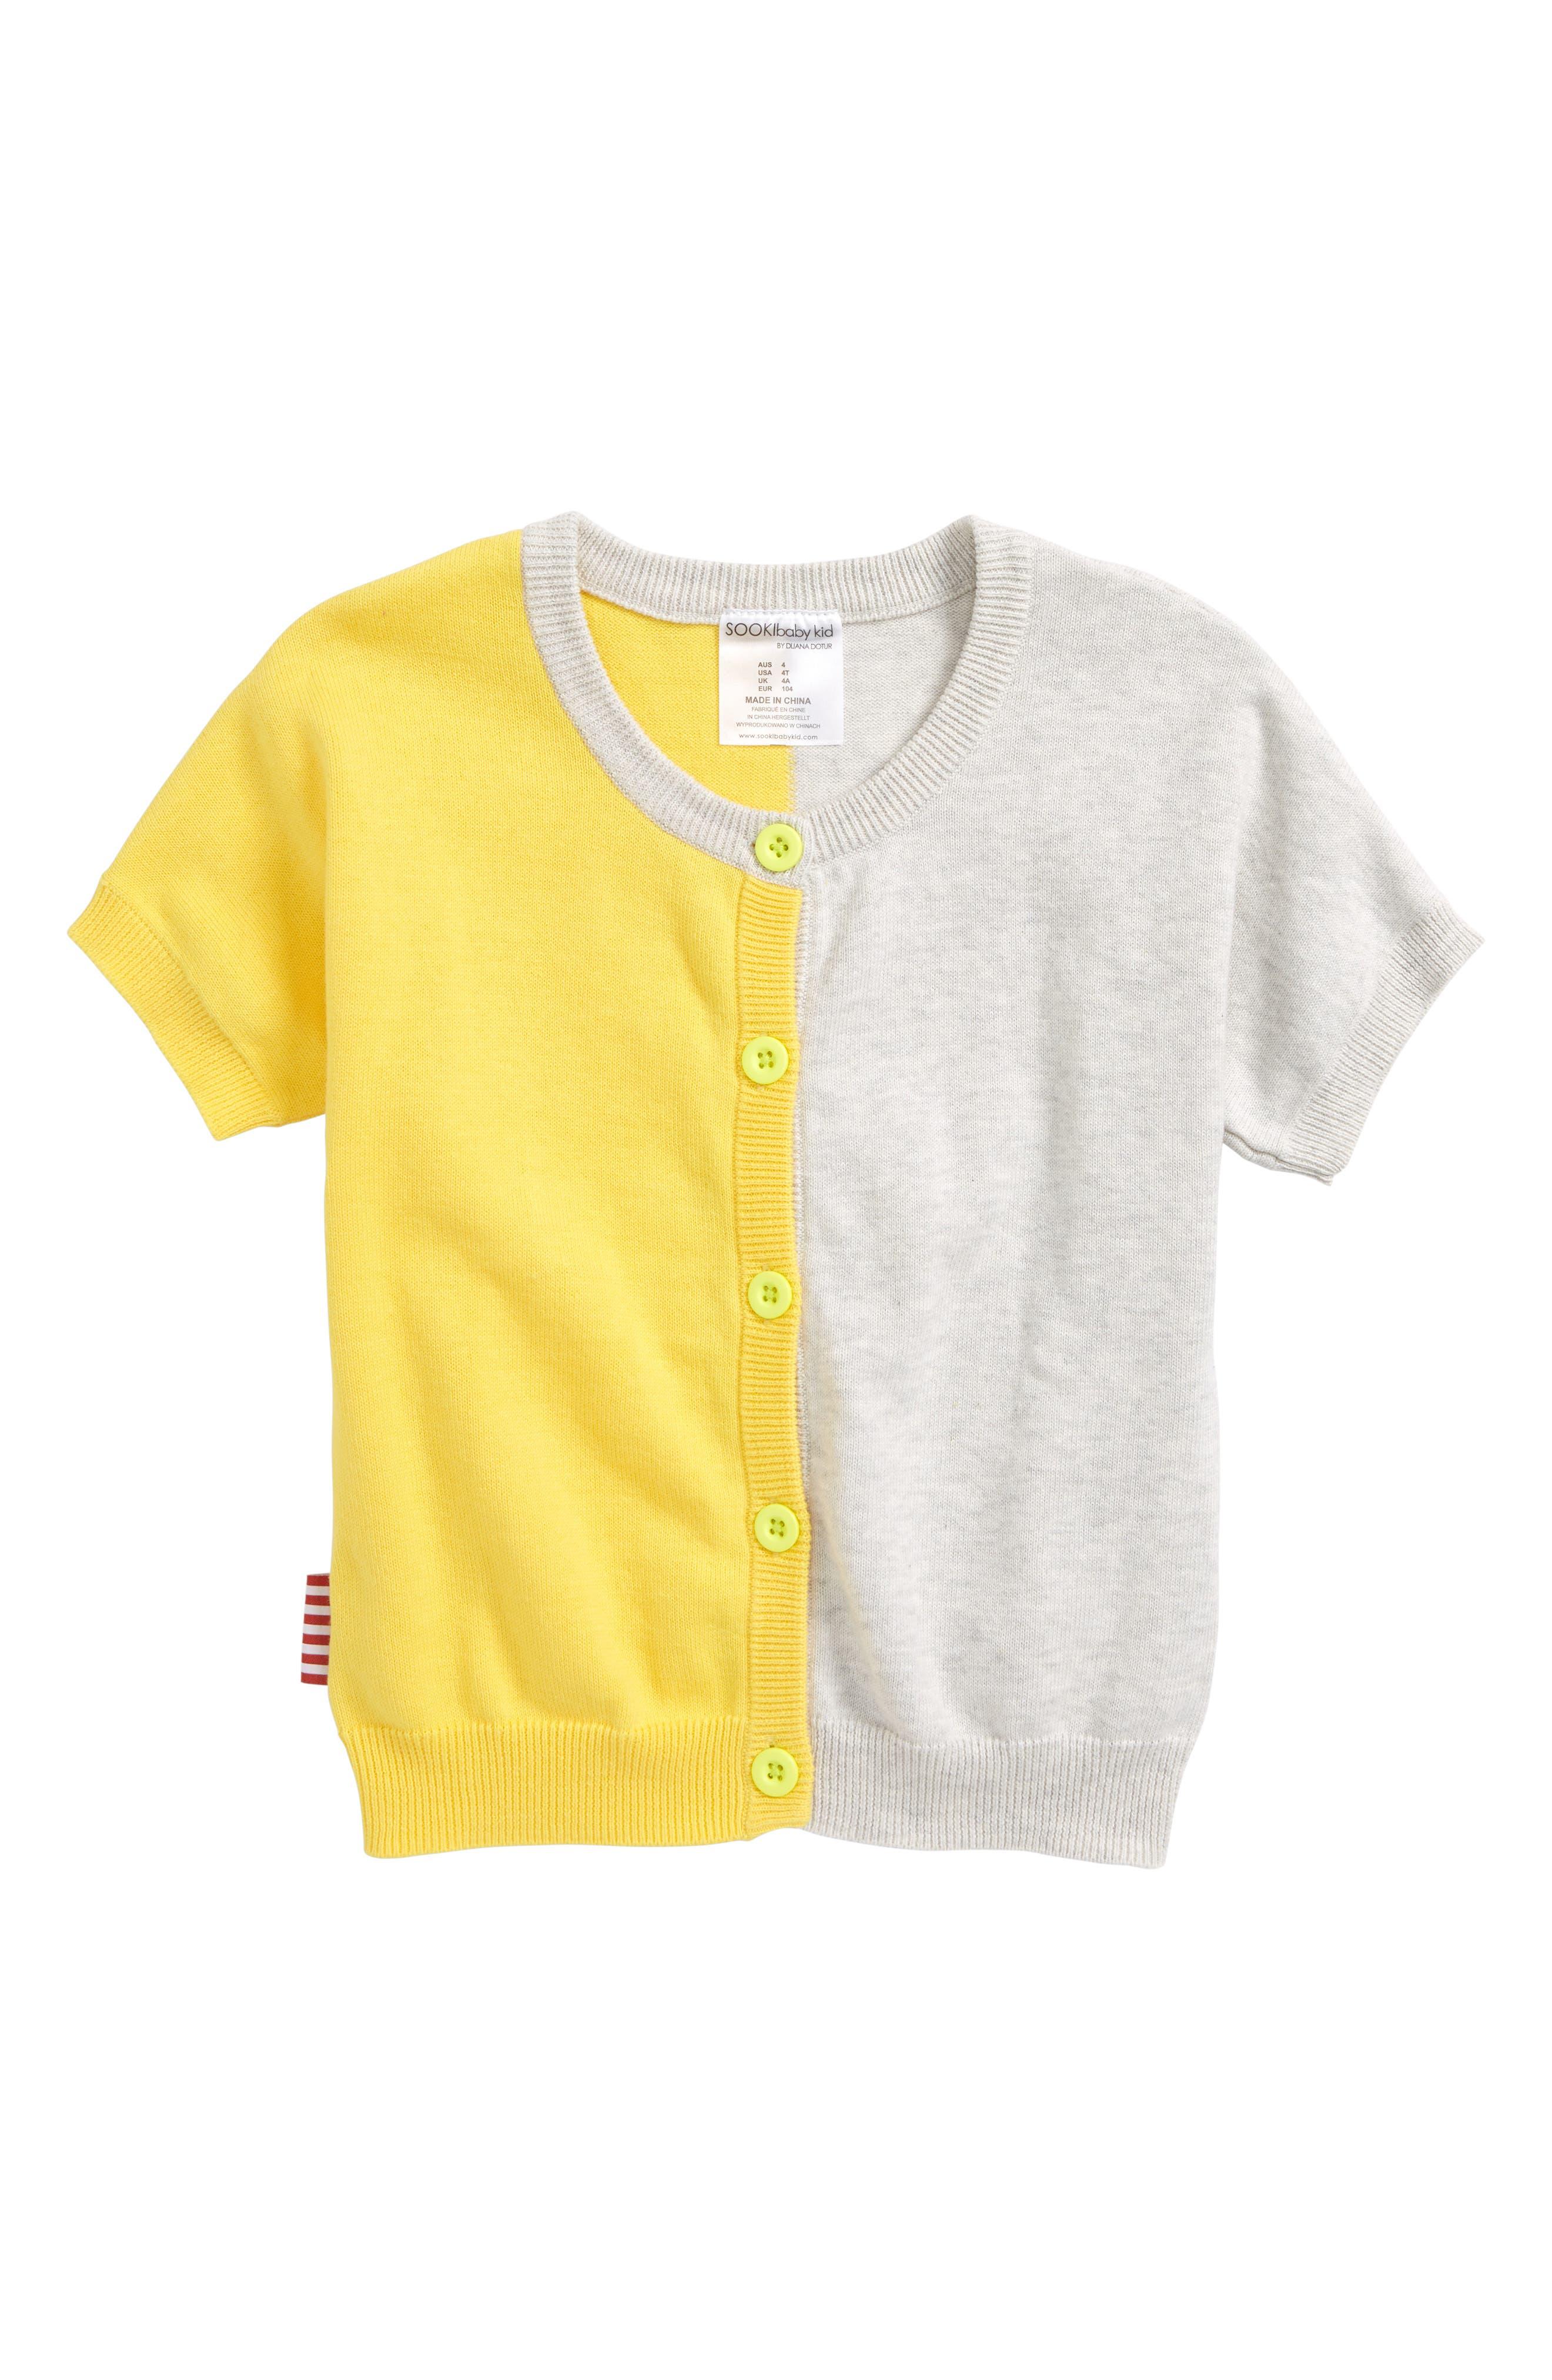 Main Image - SOOKIbaby True Knit Lemon Cardigan (Baby & Toddler)